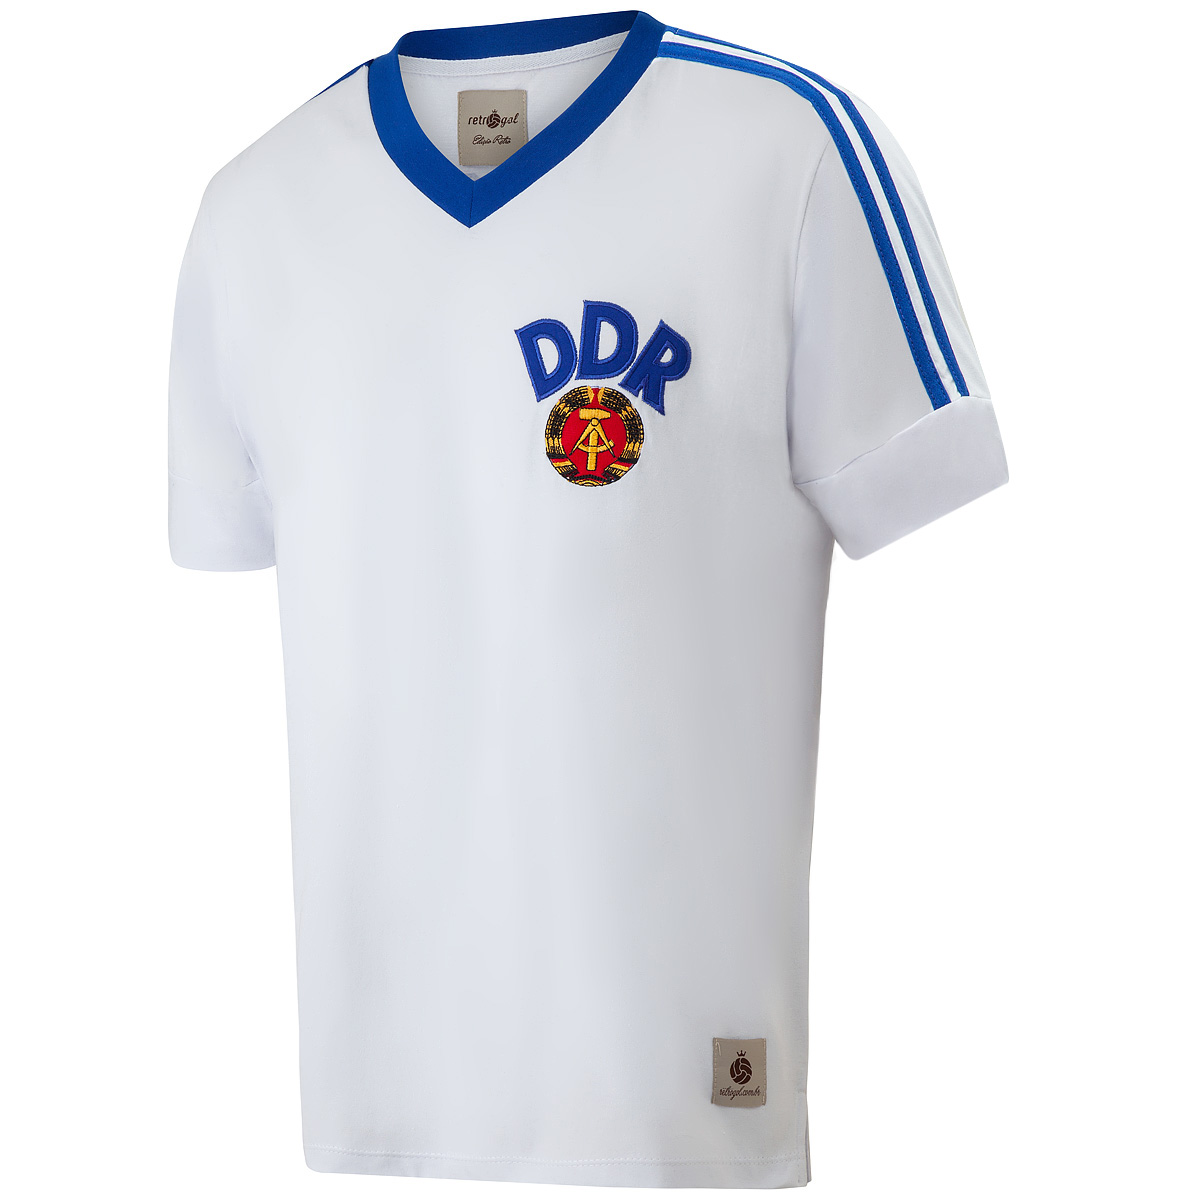 Camisa Alemanha DDR Oriental Retrô Masculina